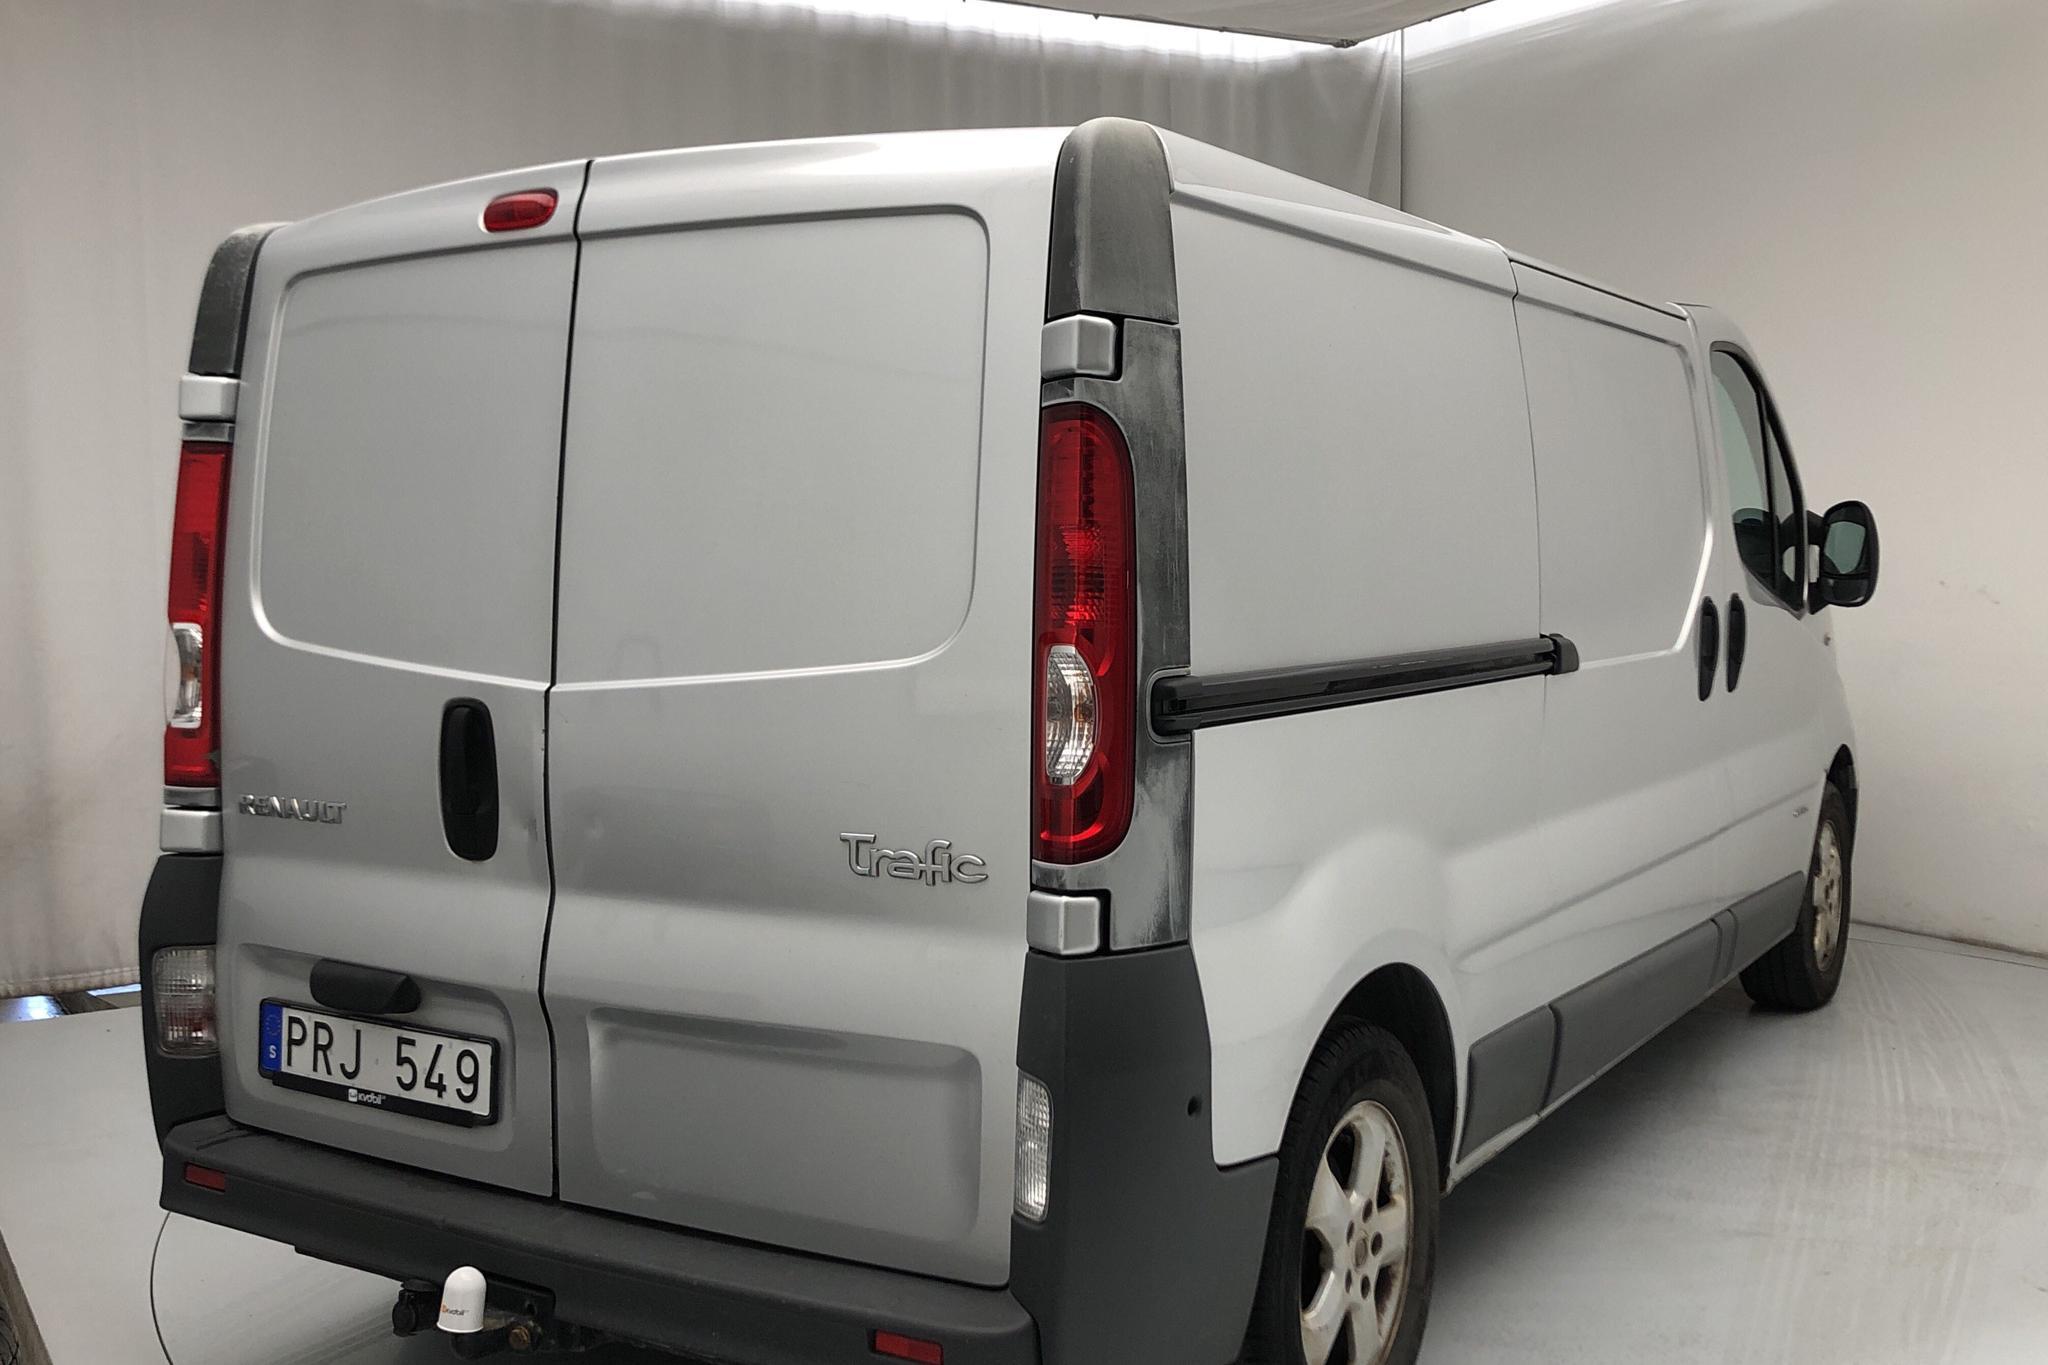 Renault Trafic 2.0 dCi Skåp/Buss (115hk) - 161 180 km - Manual - silver - 2012